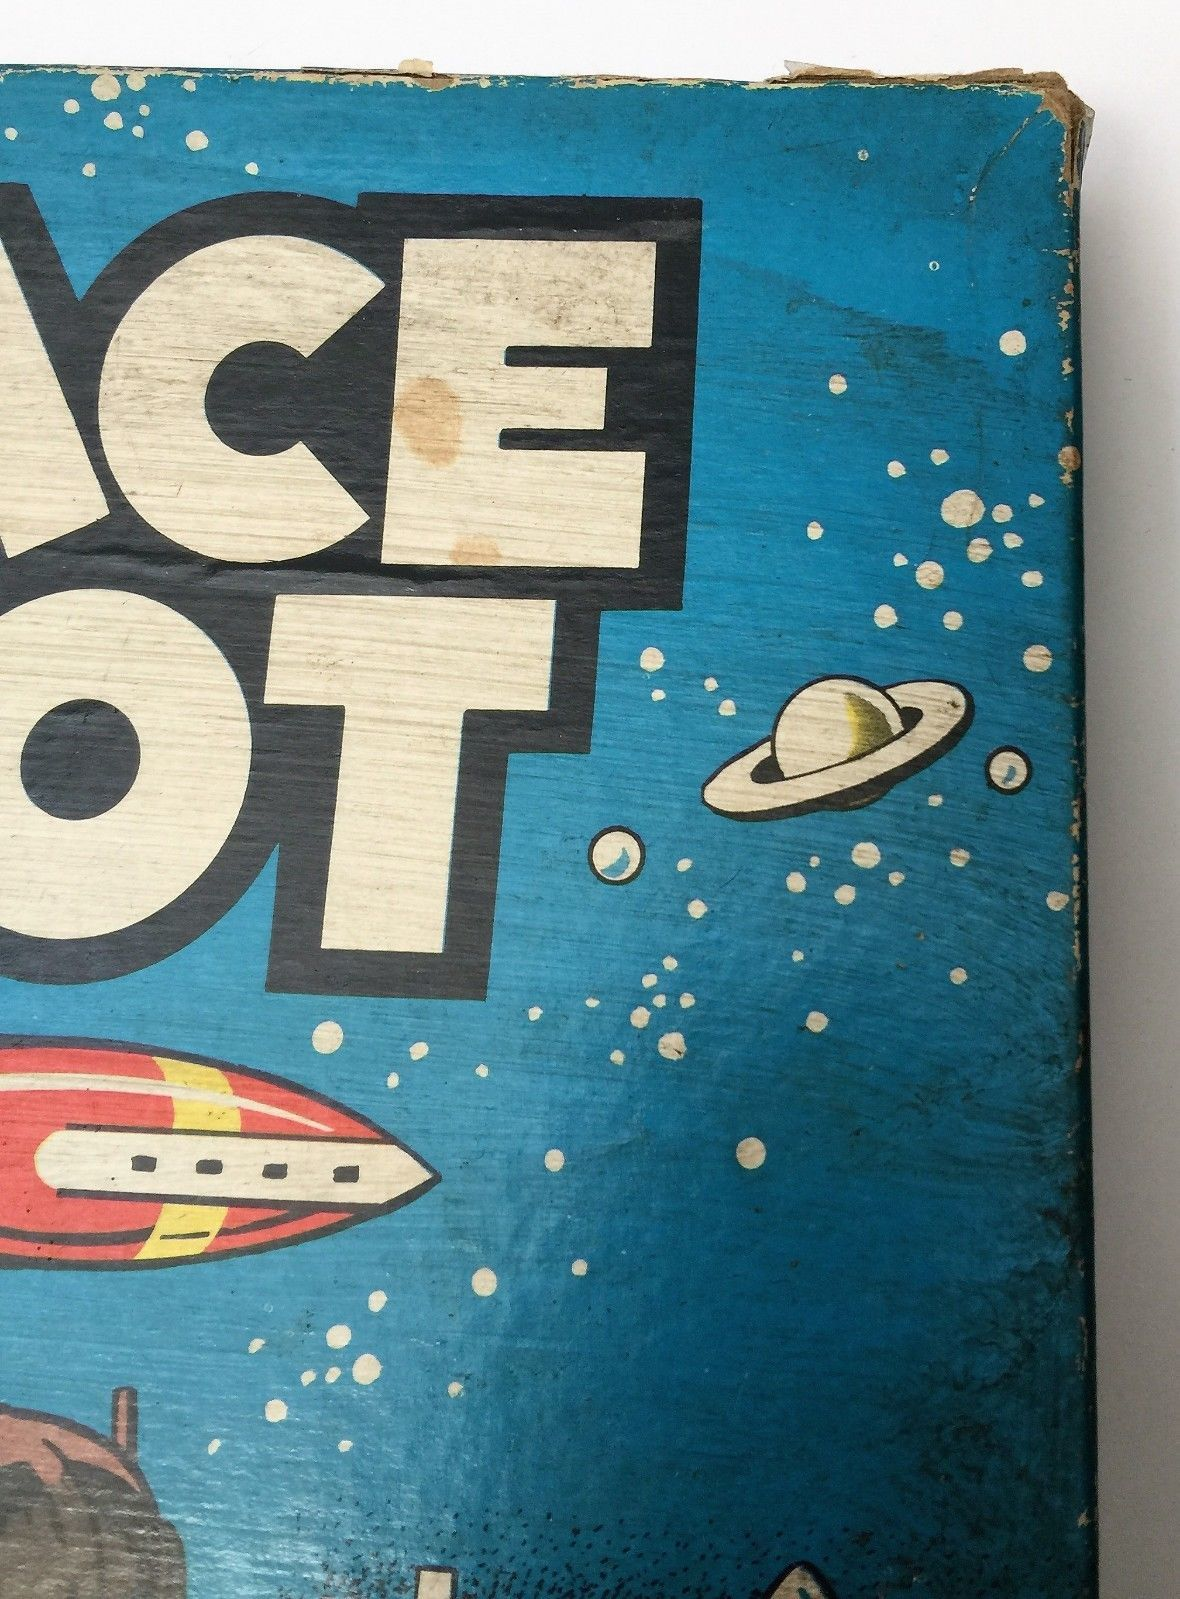 VTG Vintage 1951 Space Pilot by Cadaco Ellis Board Game HARD TO FIND HTF image 8